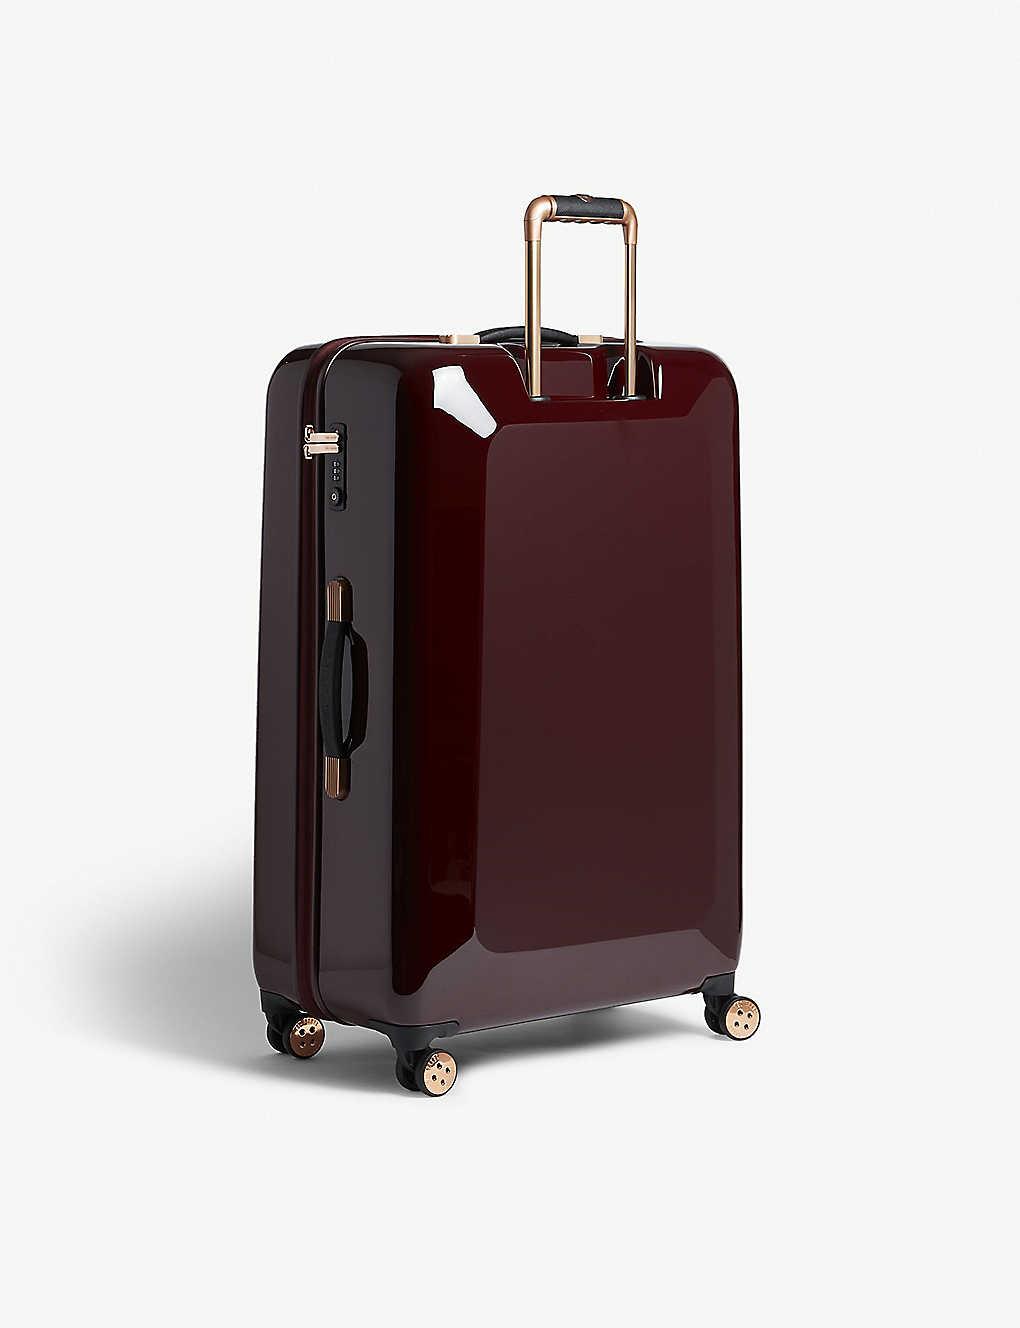 6e0ea0132ac3 TED BAKER - Take Flight Porcelain Rose large four-wheel suitcase ...